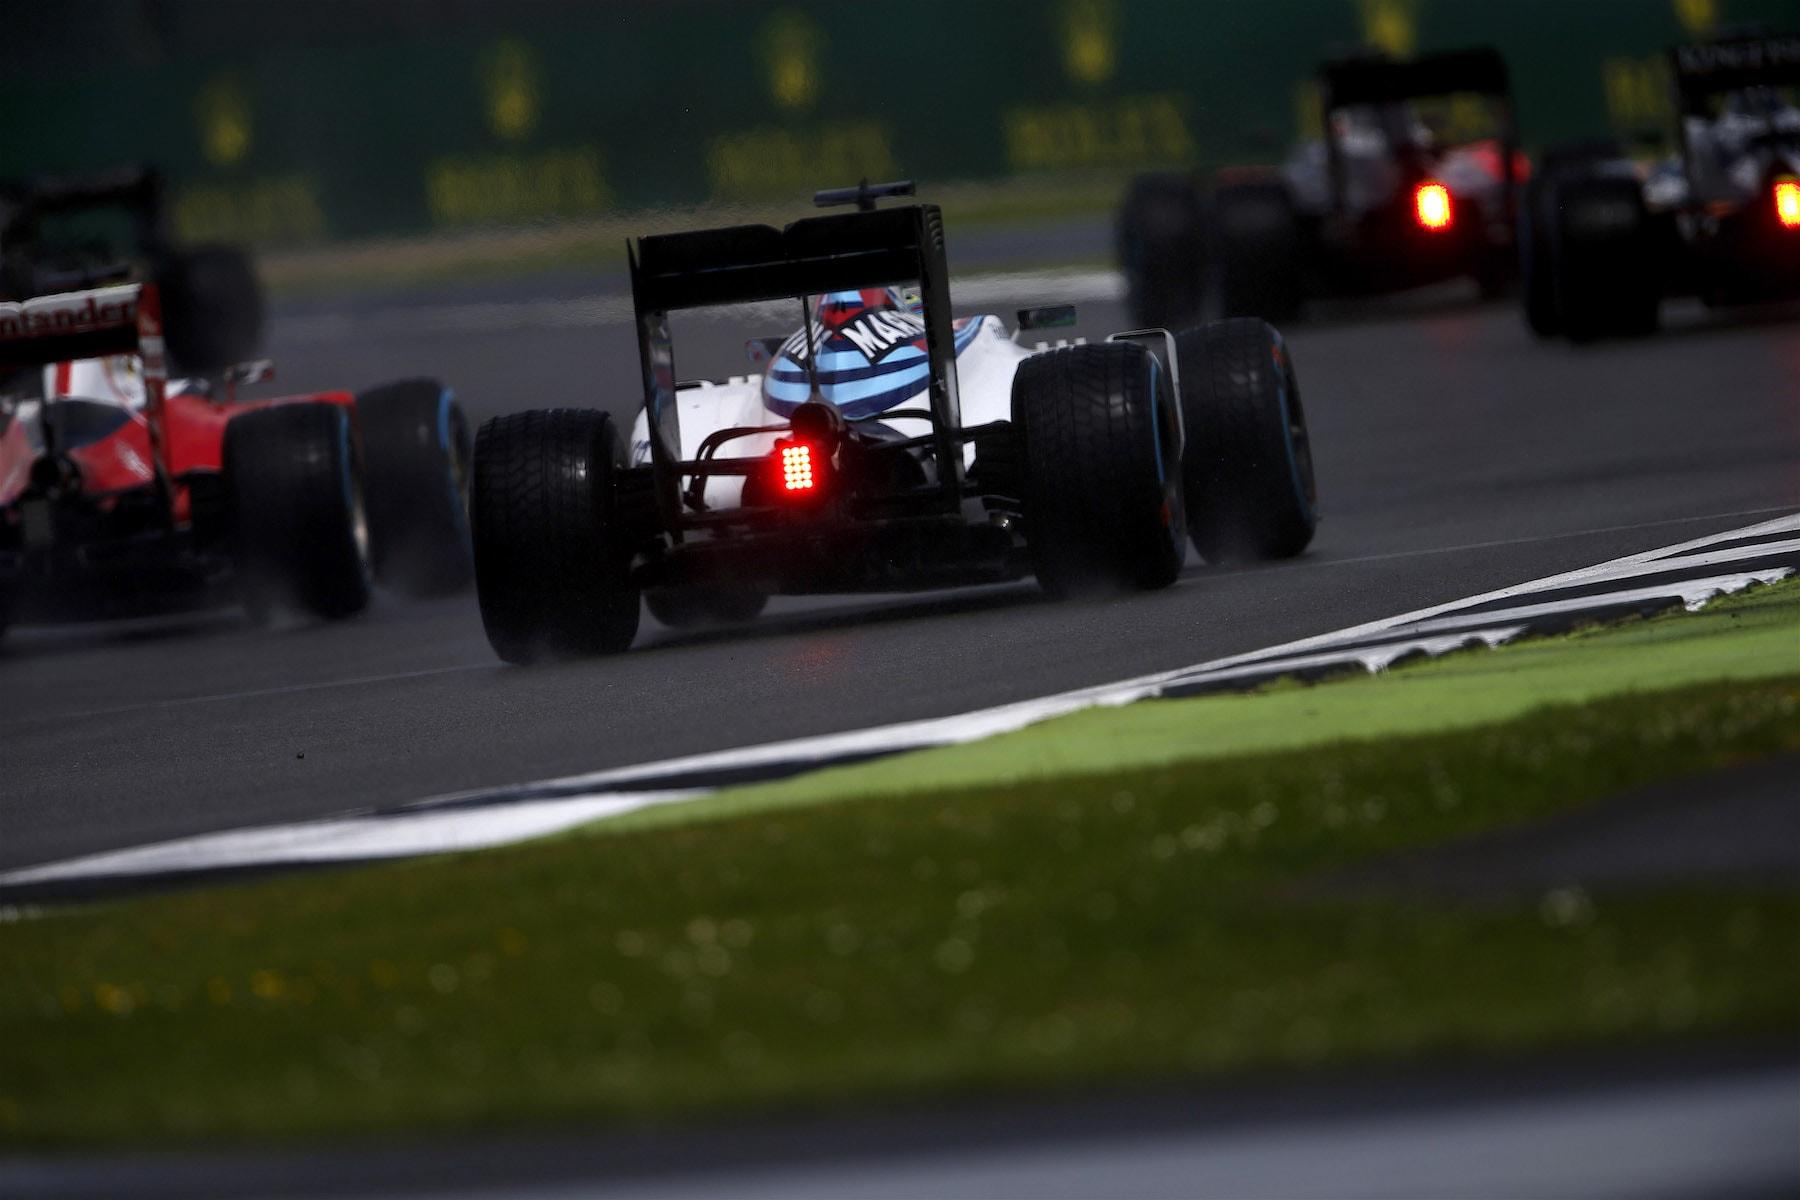 Salracing | Felipe Massa | Williams F1 team